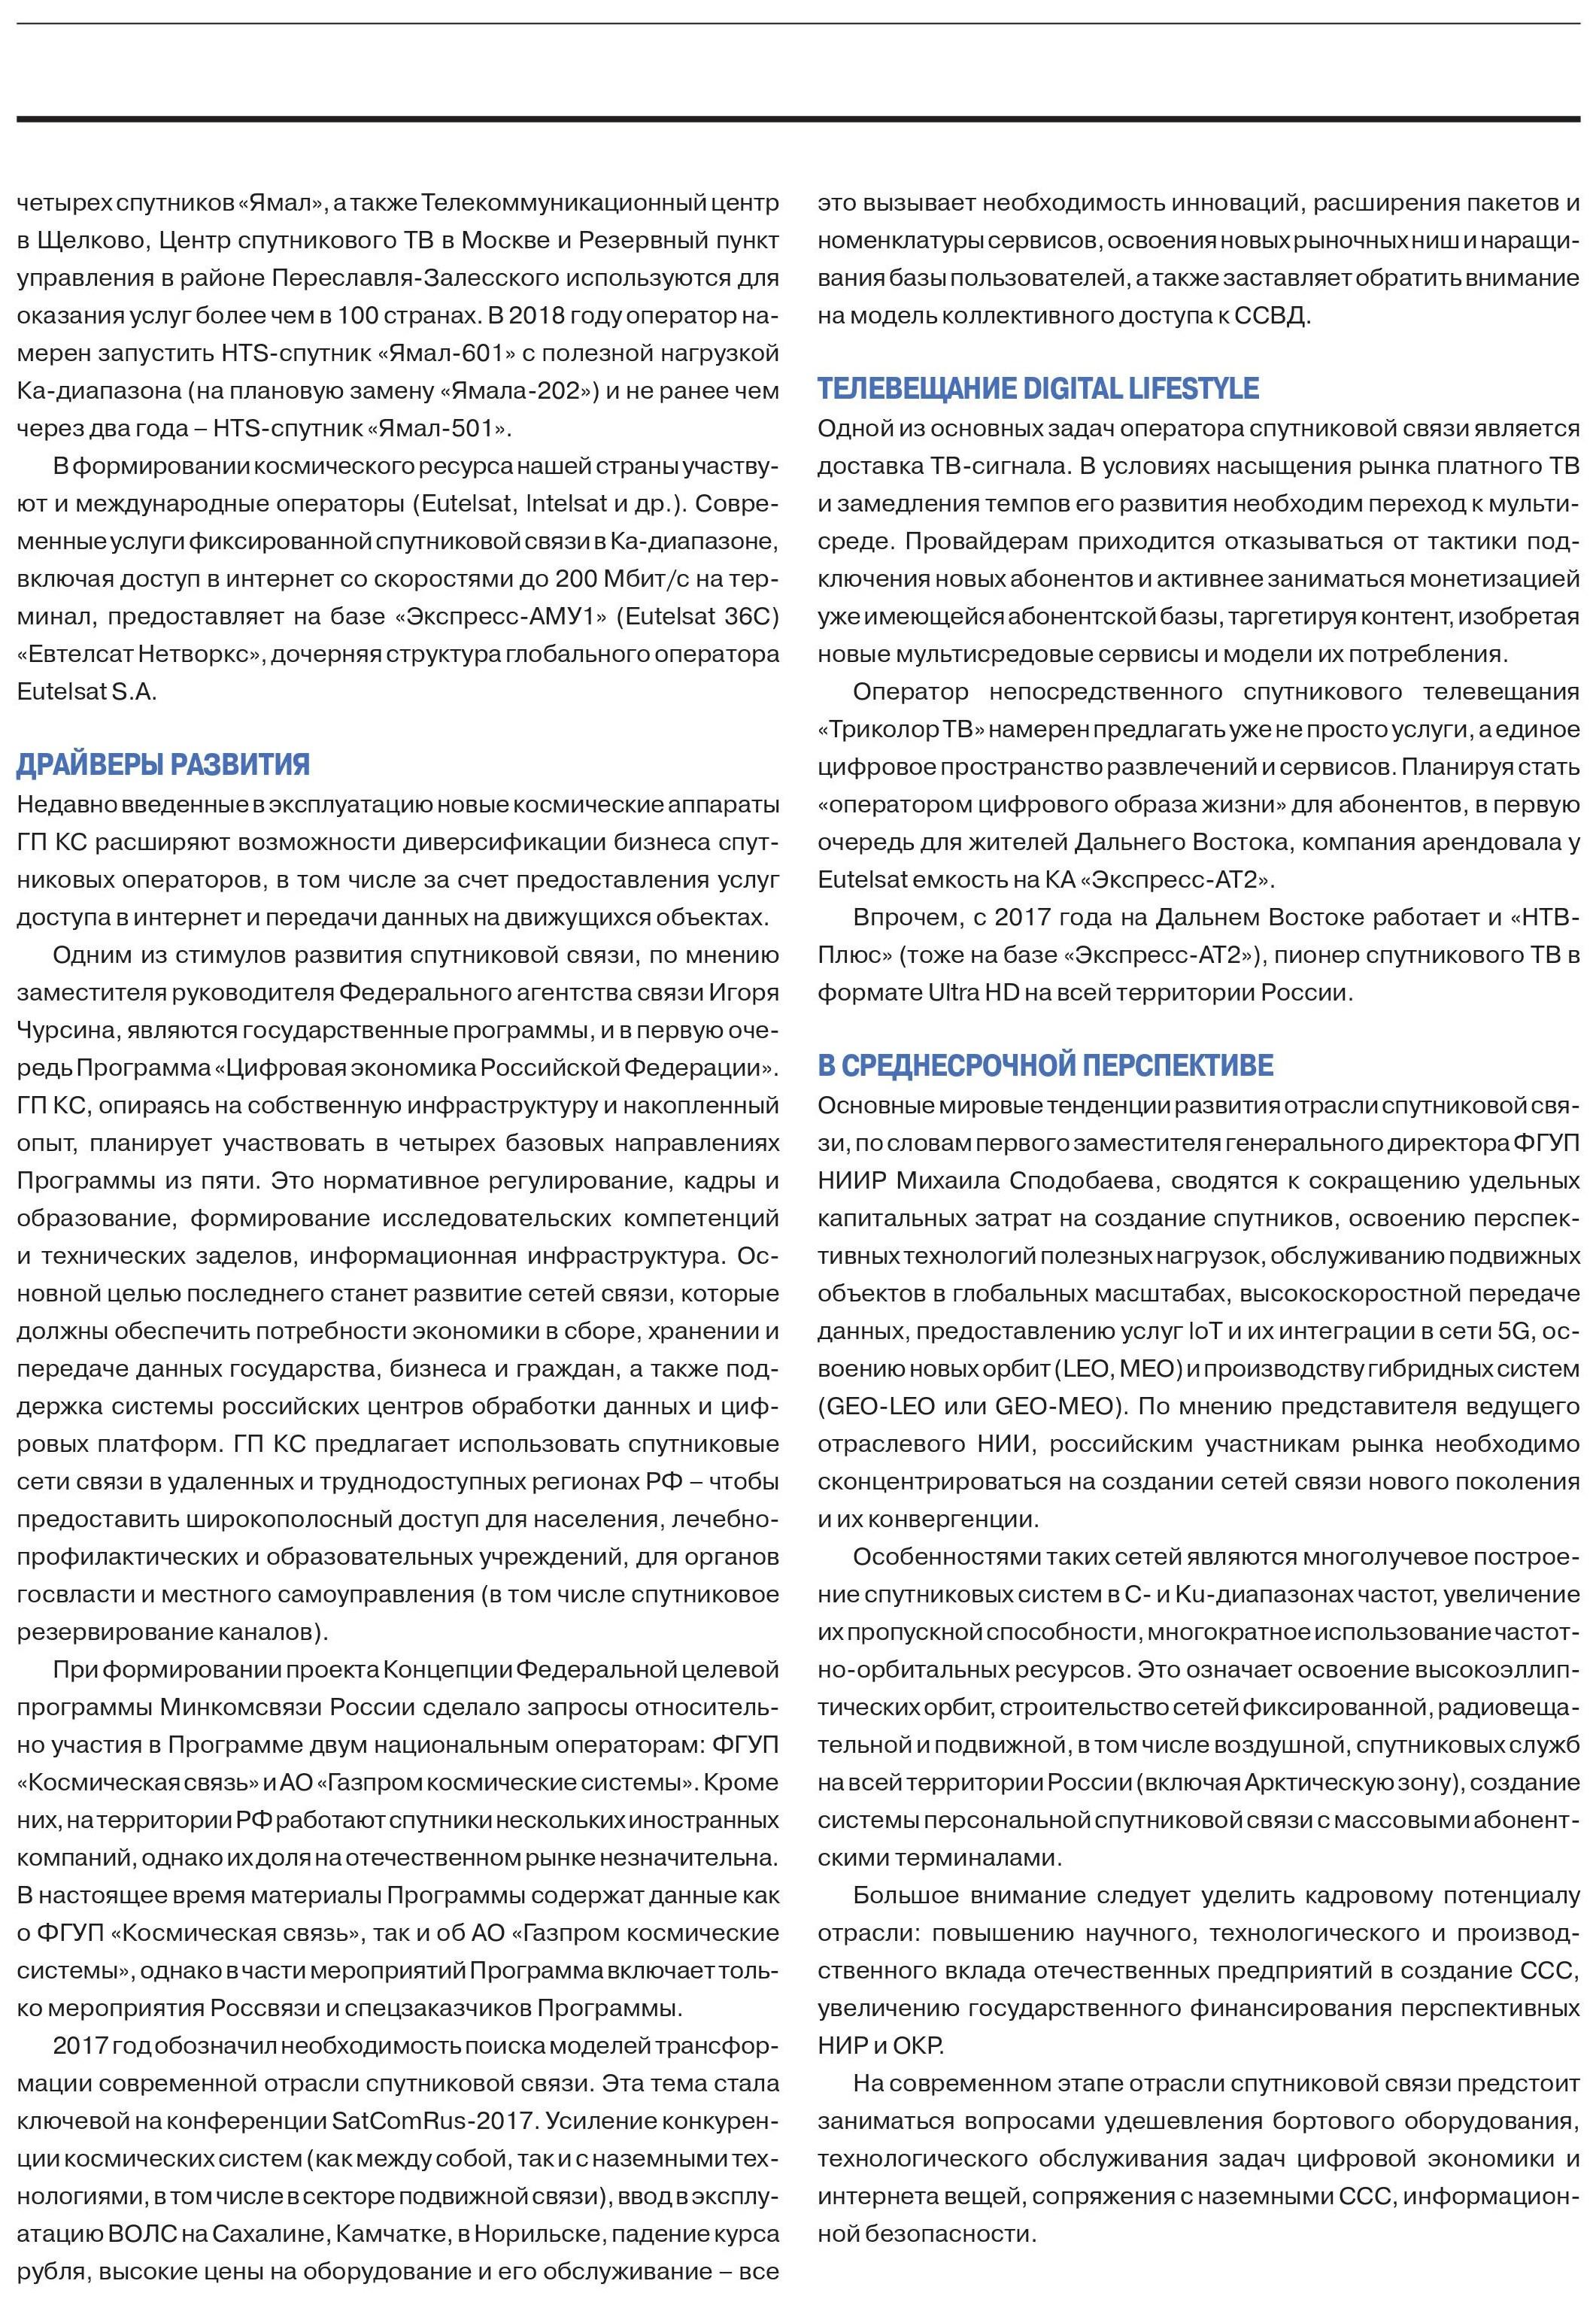 ES-1-2018-Sputniki-2